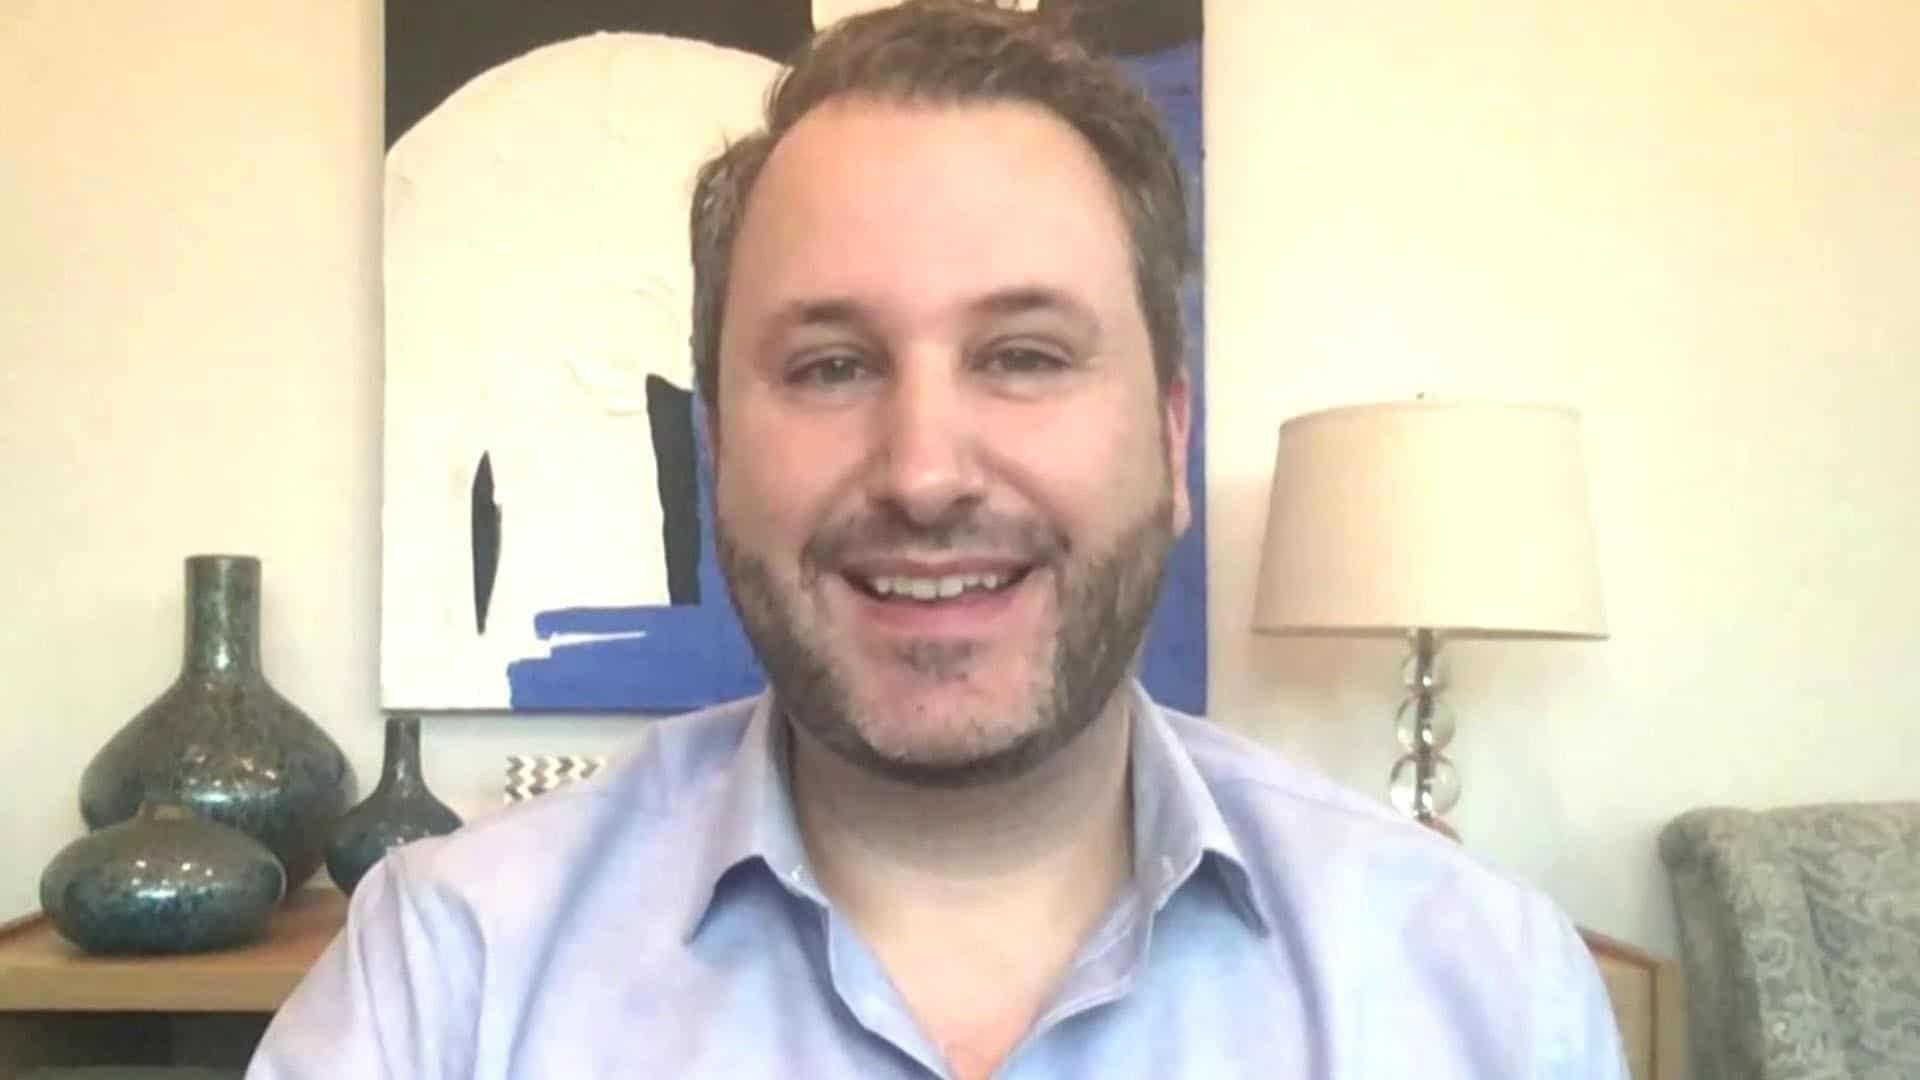 Chris Van Duesena